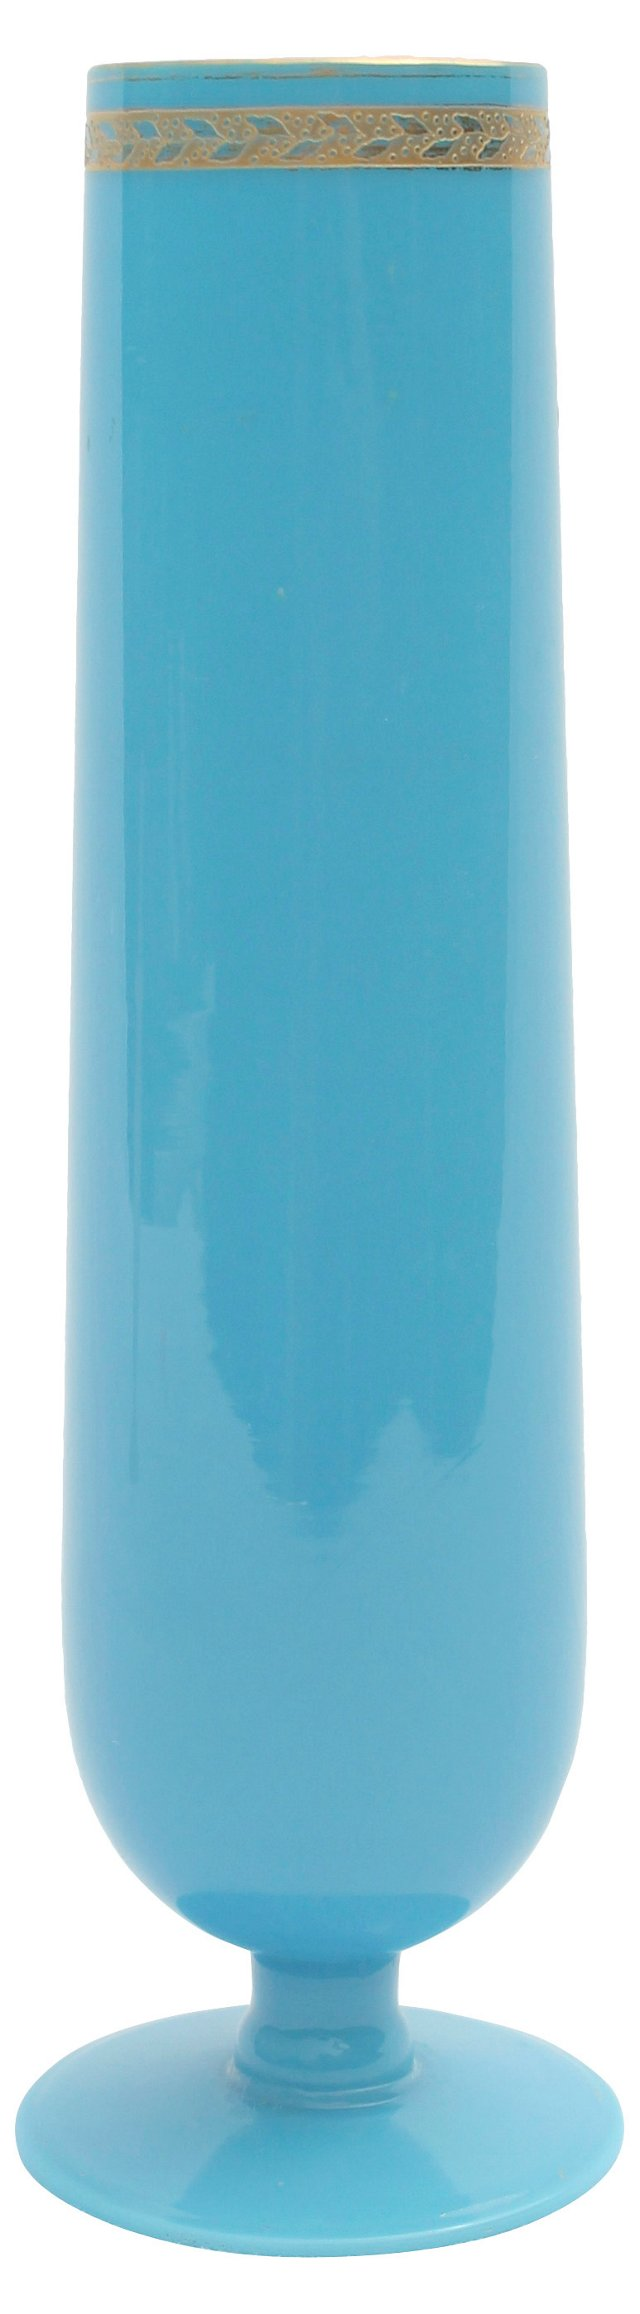 Blue Bristol Glass Vase